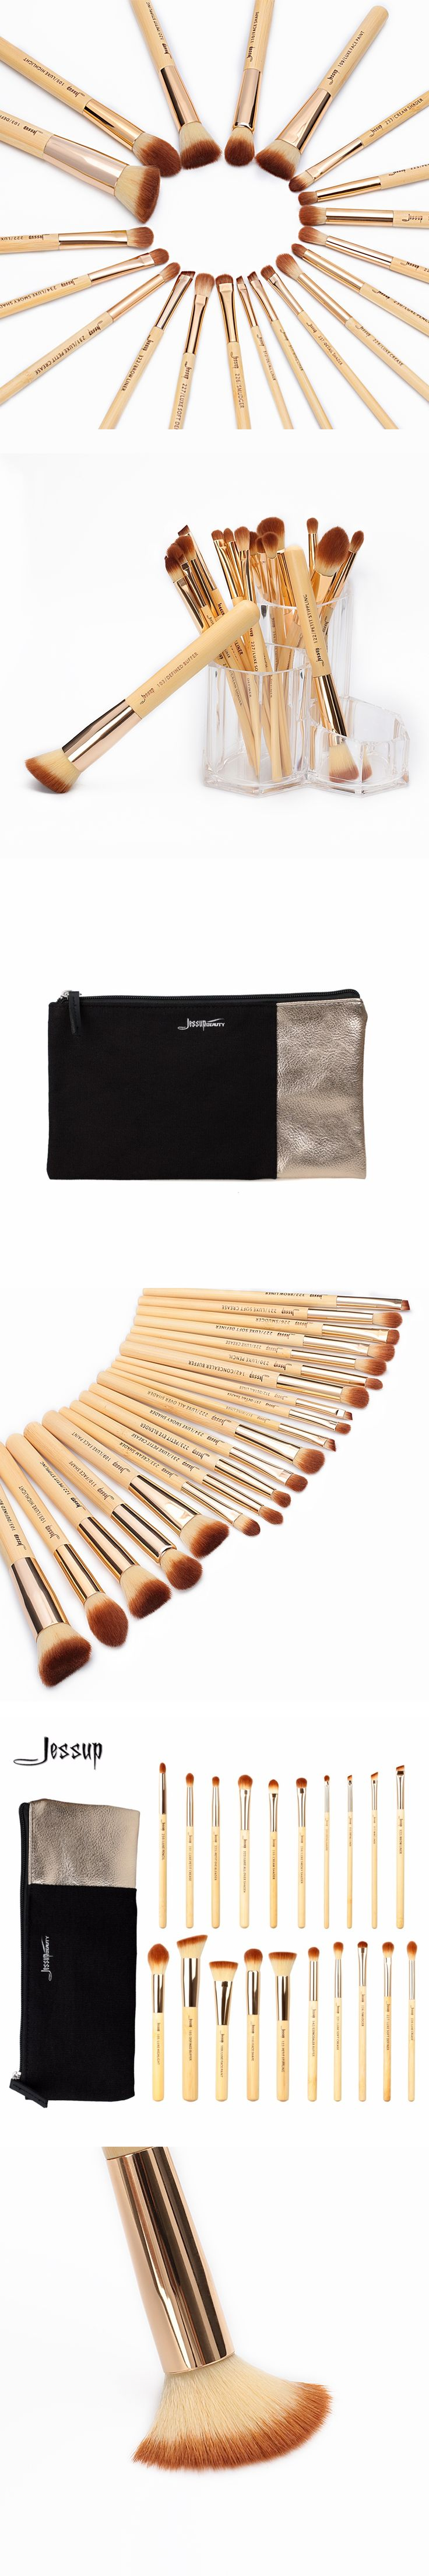 Jessup  20pcs Beauty Bamboo Professional Makeup Brushes Set T145 & Cosmetics Bags Women Bag CB002